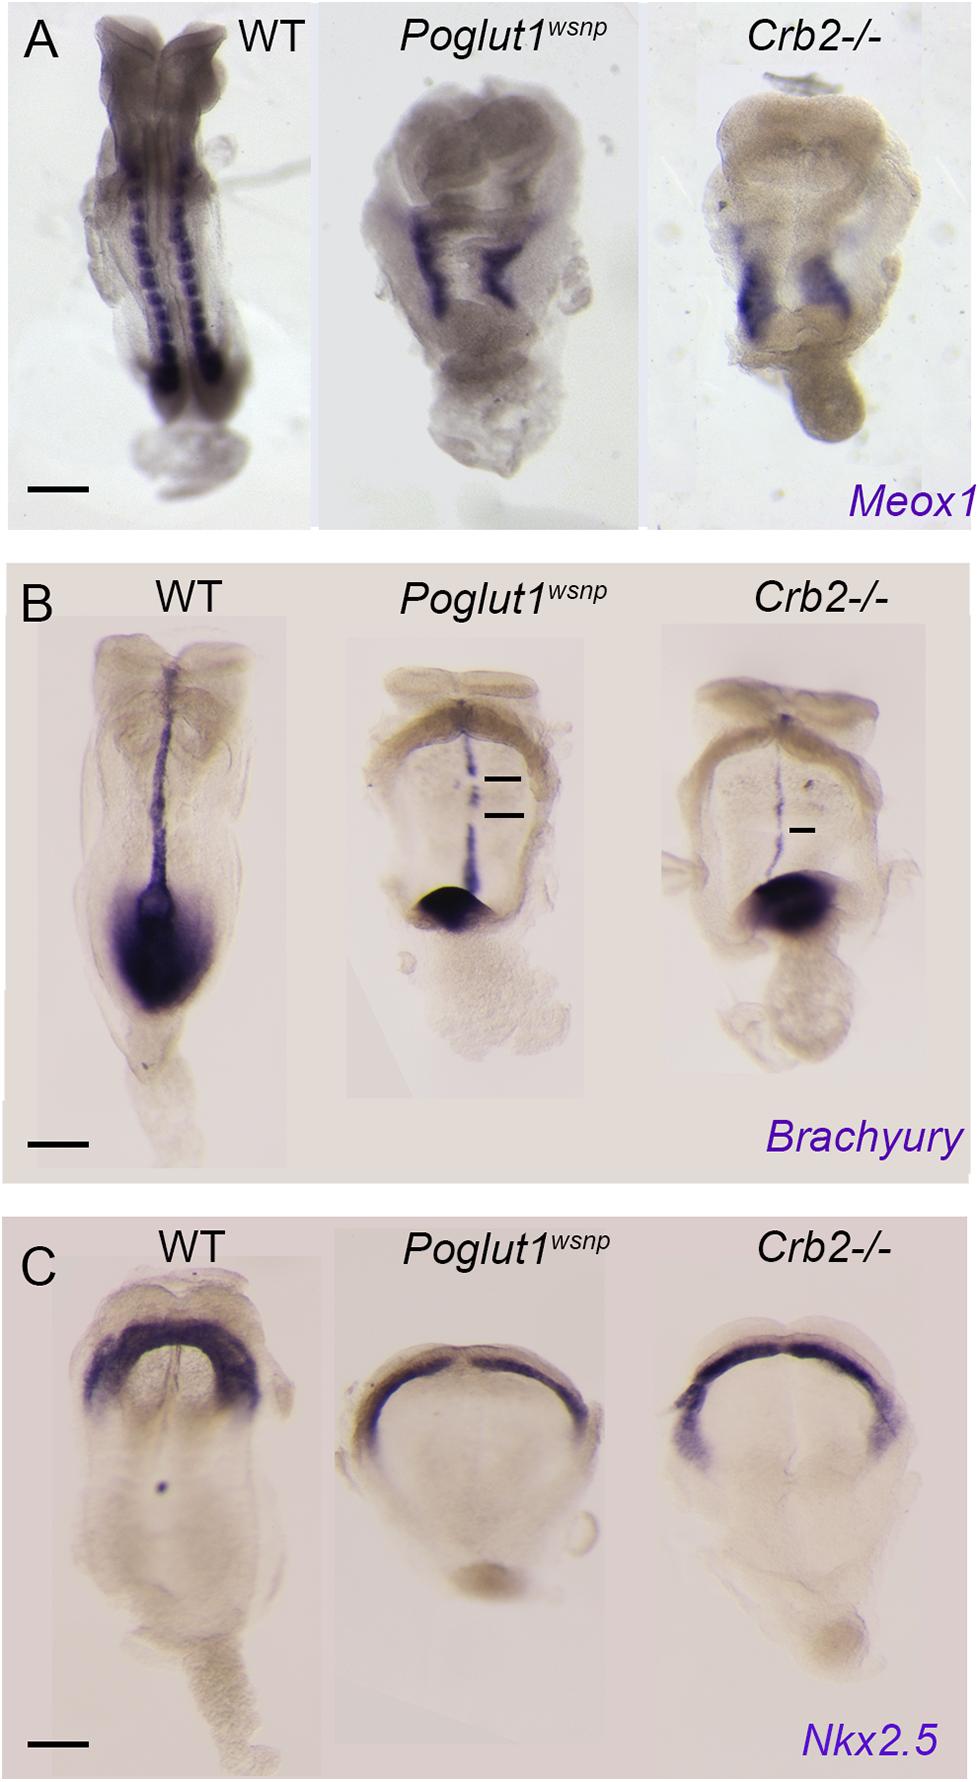 Indistinguishable phenotypes of early <i>Poglut1</i><sup><i>wsnp</i></sup> and <i>Crumbs2</i> mutant embryos.